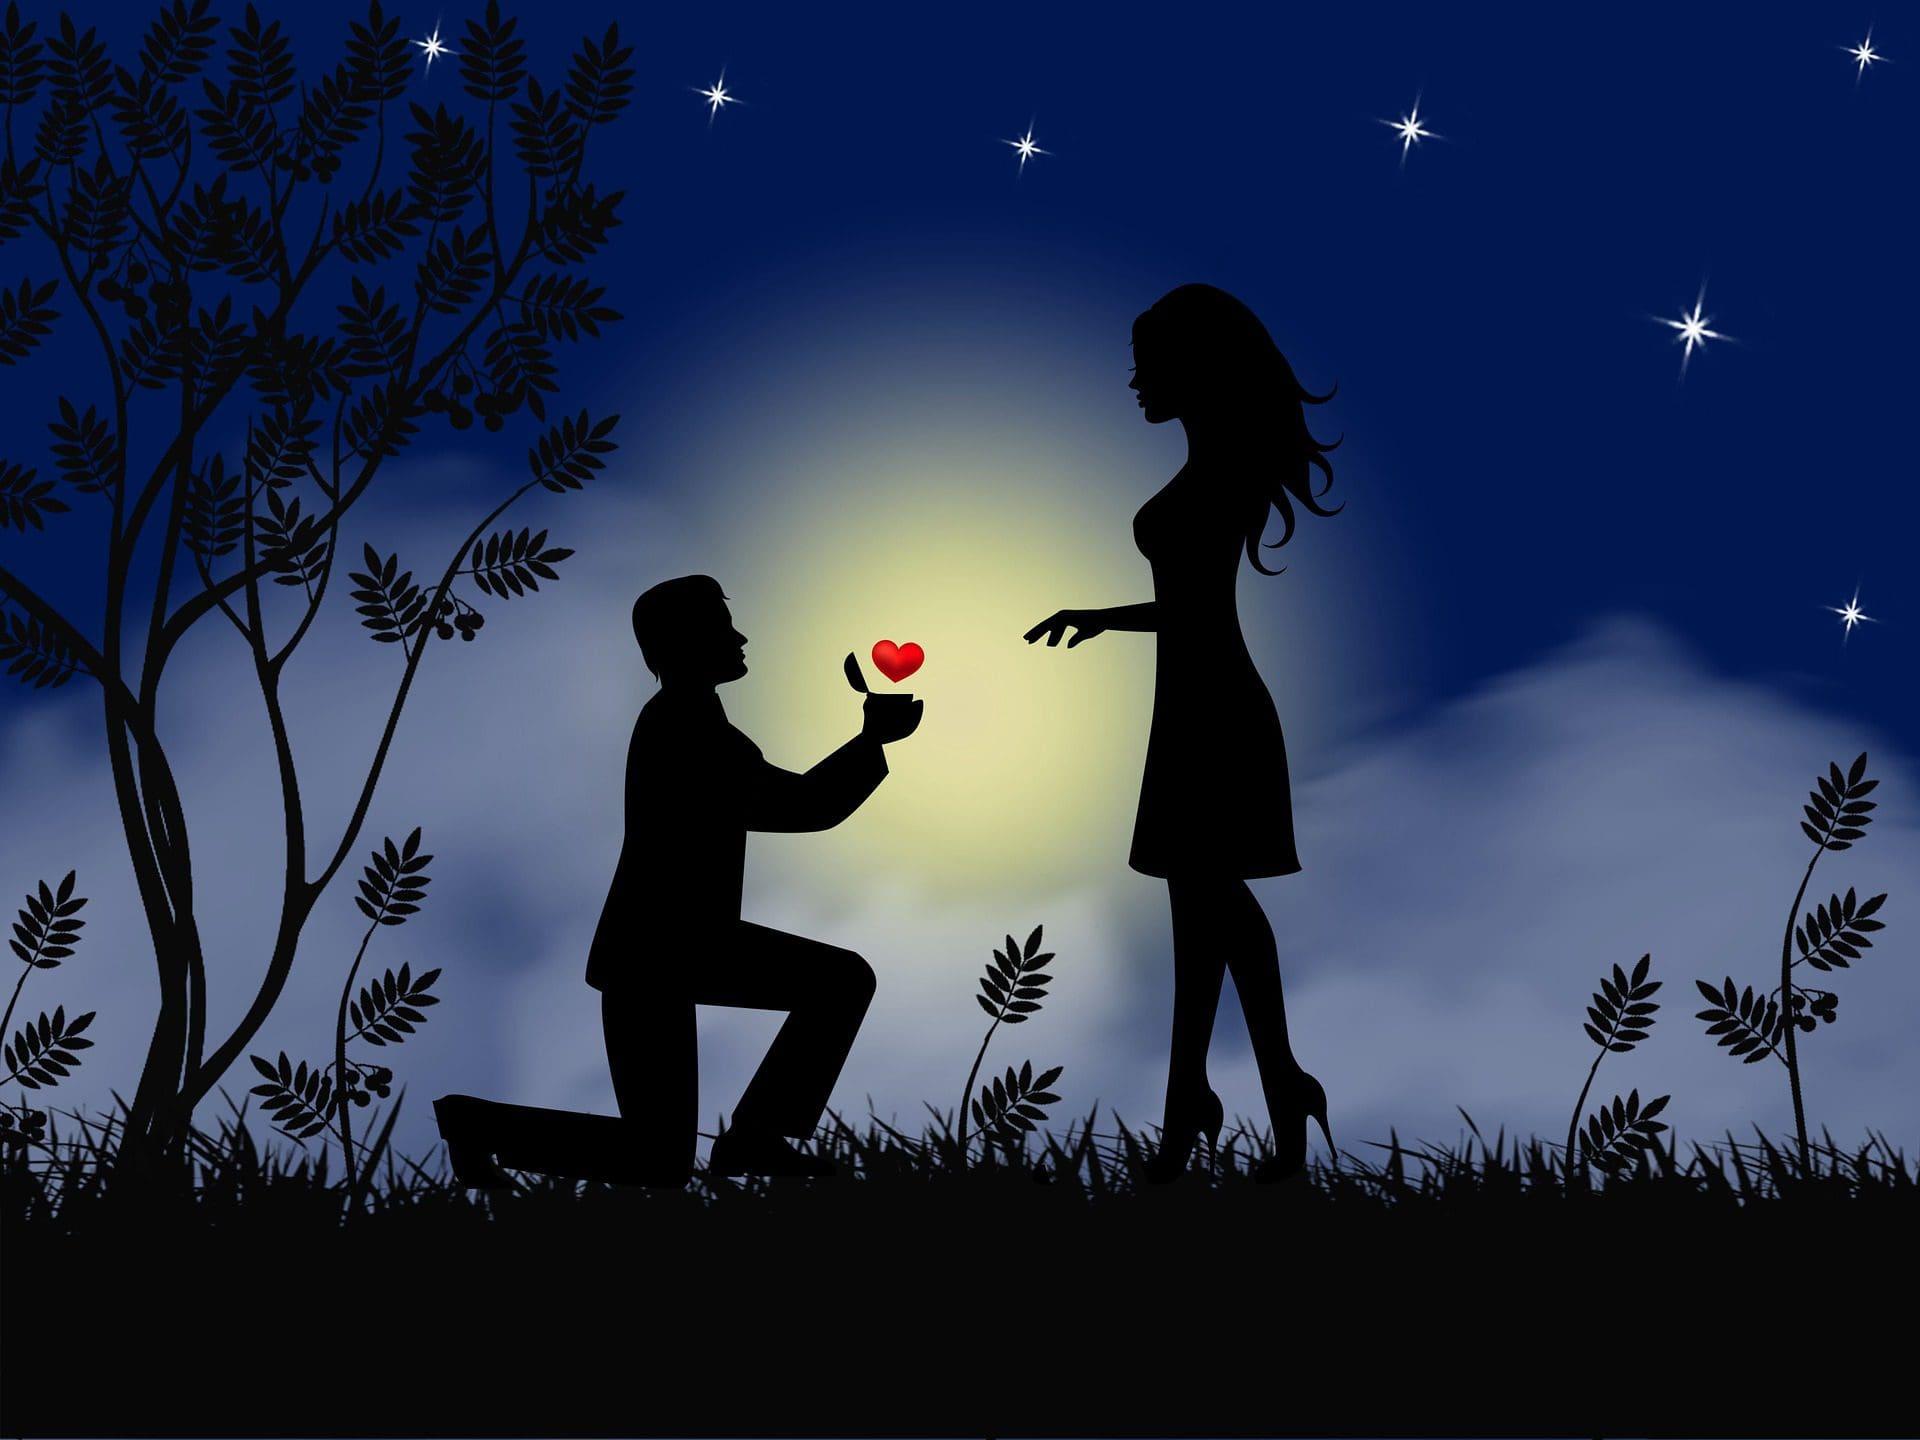 Прикольные картинки про романтику со смыслом мужчине, юбилею лет мужчине